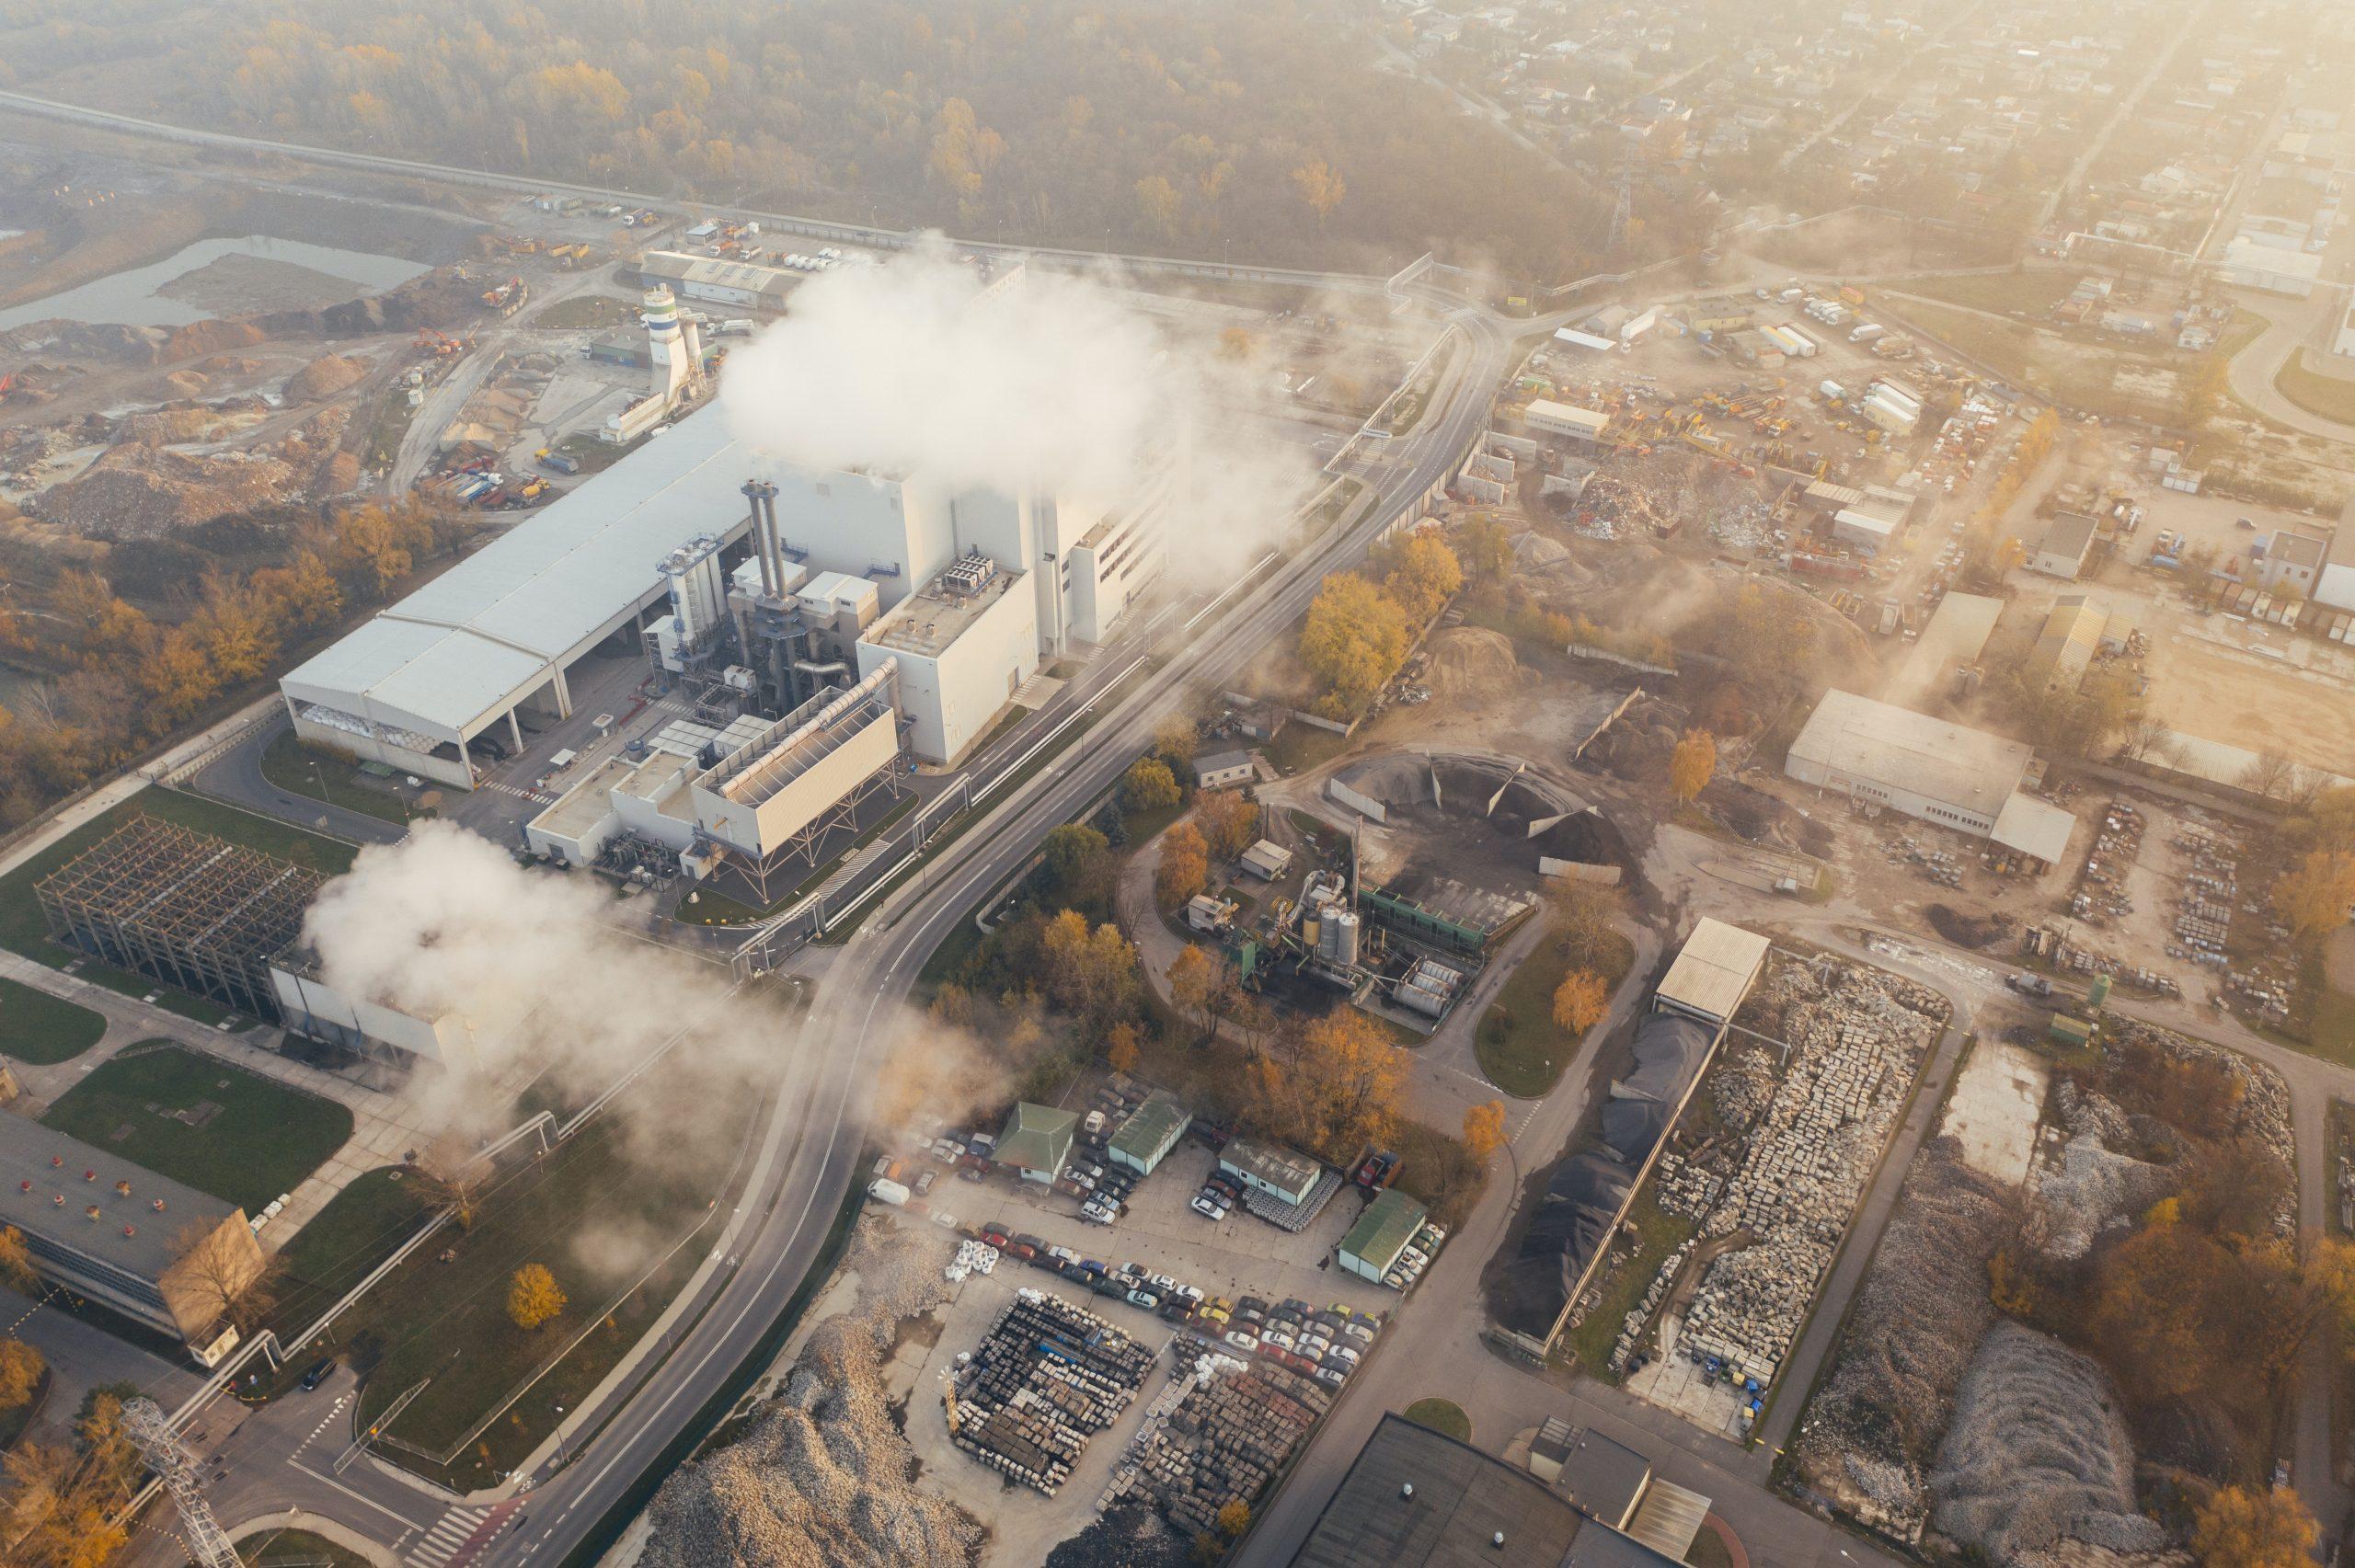 Emissions Trading Scheme UK